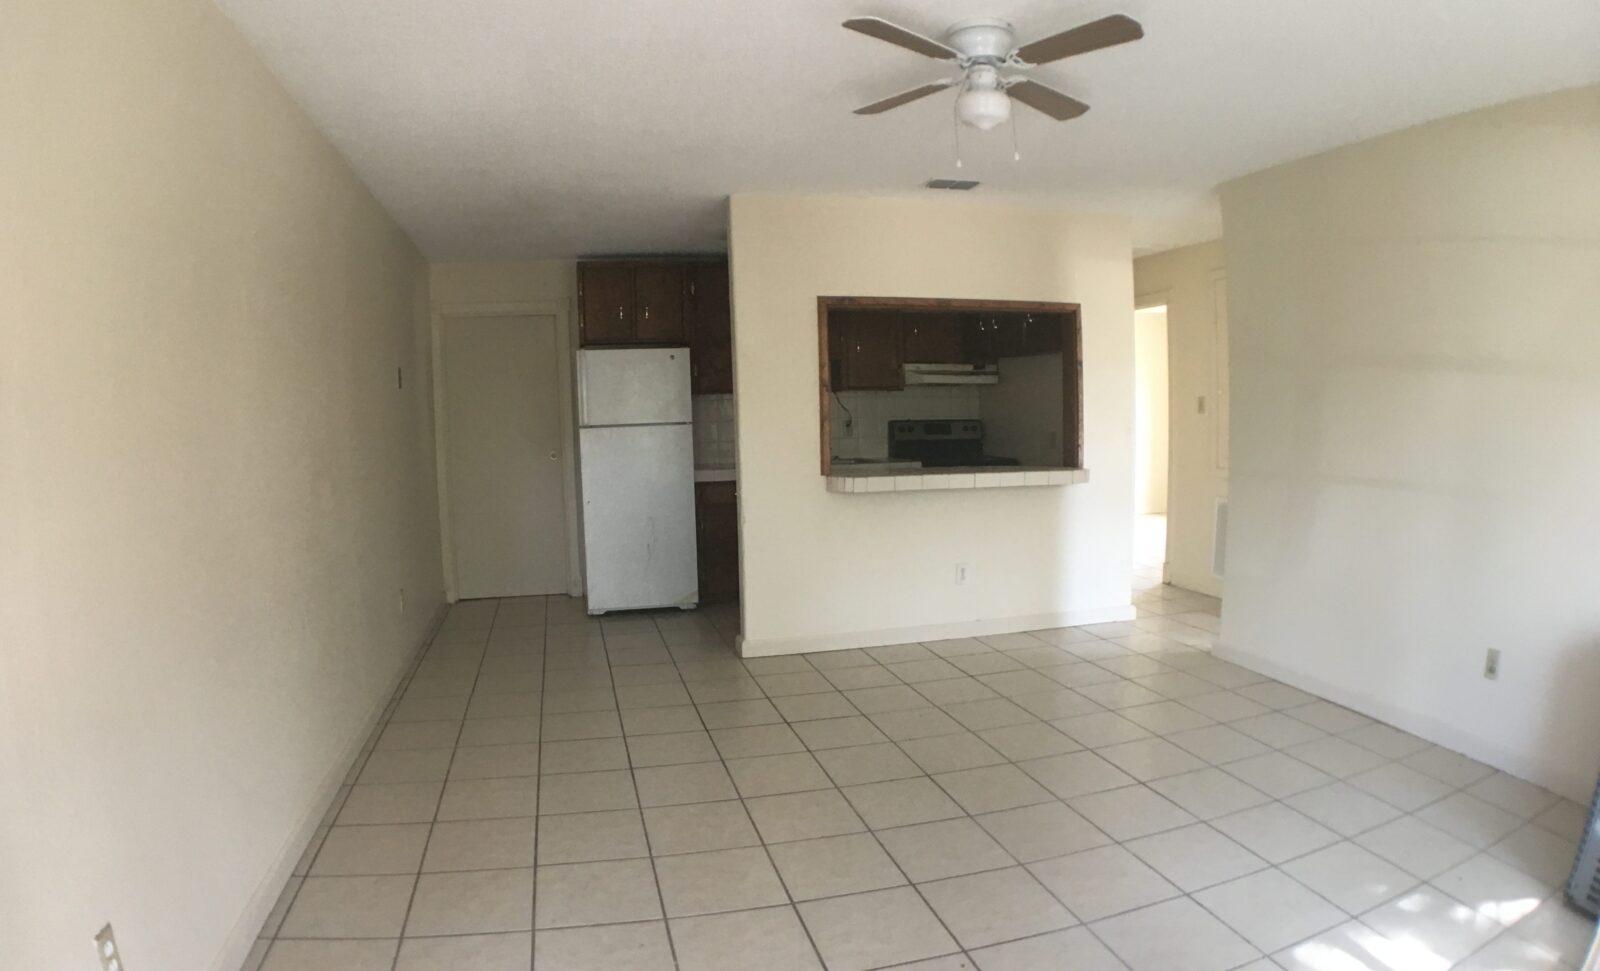 906 N 29TH STREET MCALLEN, TX 78501